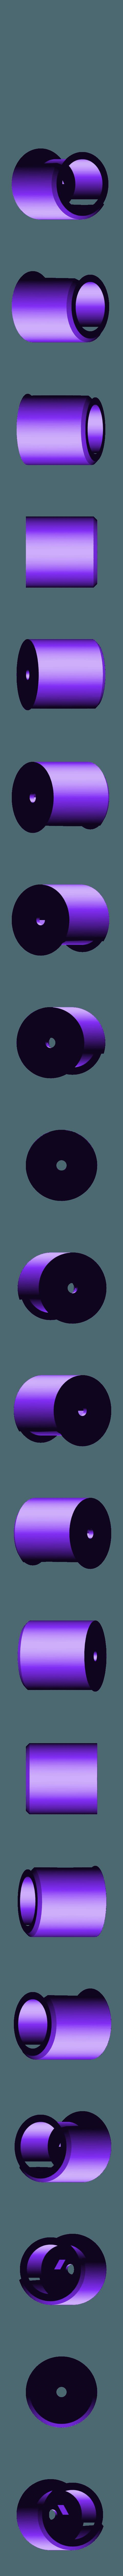 smart_full_grap_display_case_KNOB.stl Download free STL file FDM Printer de Kleine Reus 300x300x900 • 3D printable object, Job